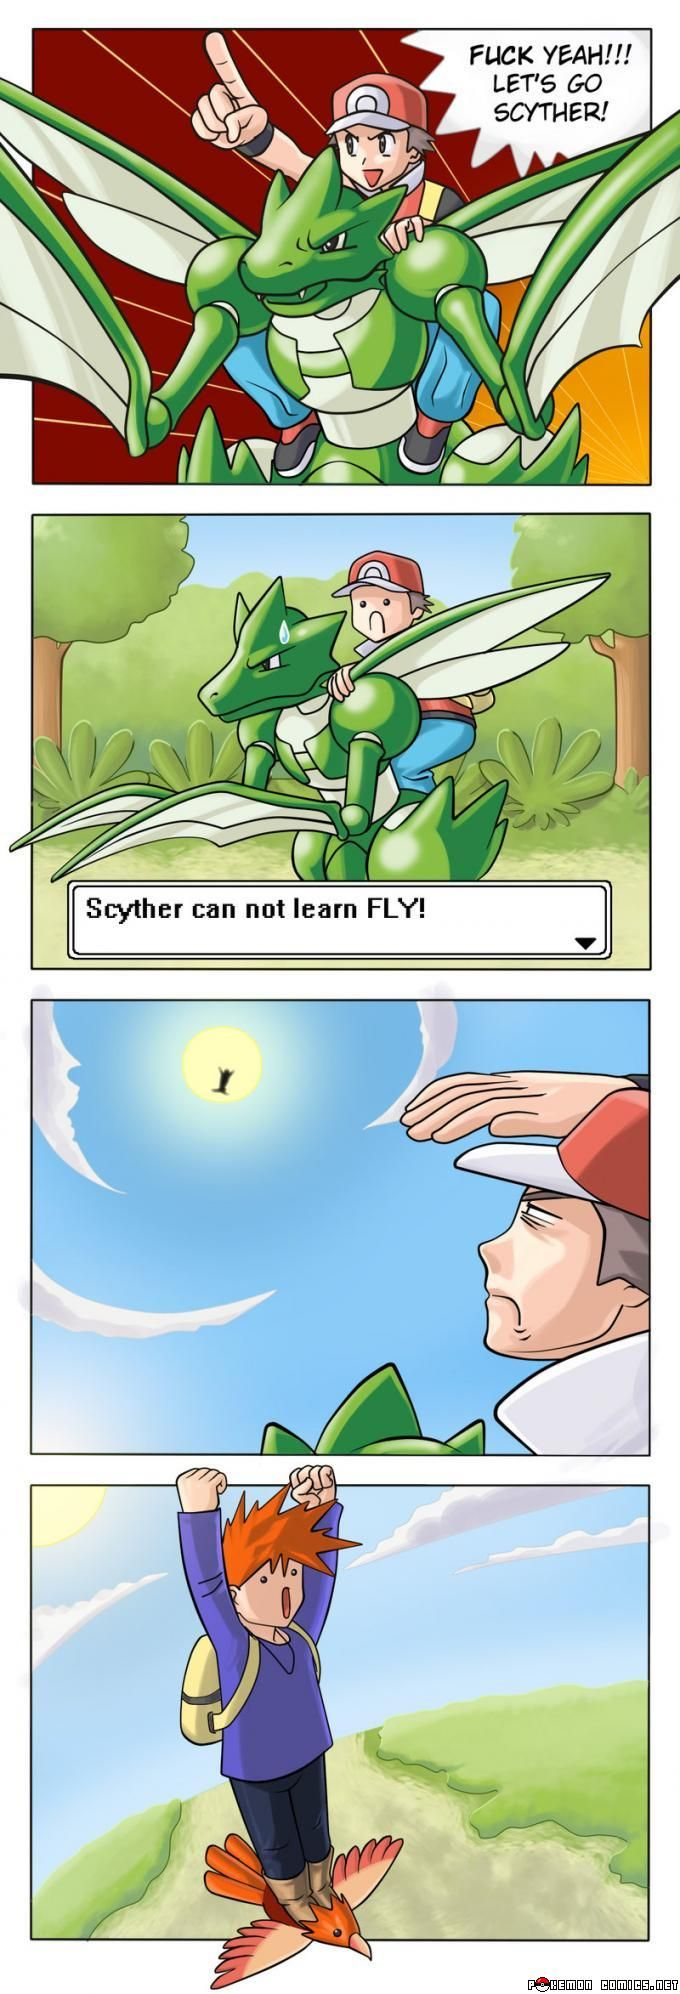 Even more #PokemonLogic